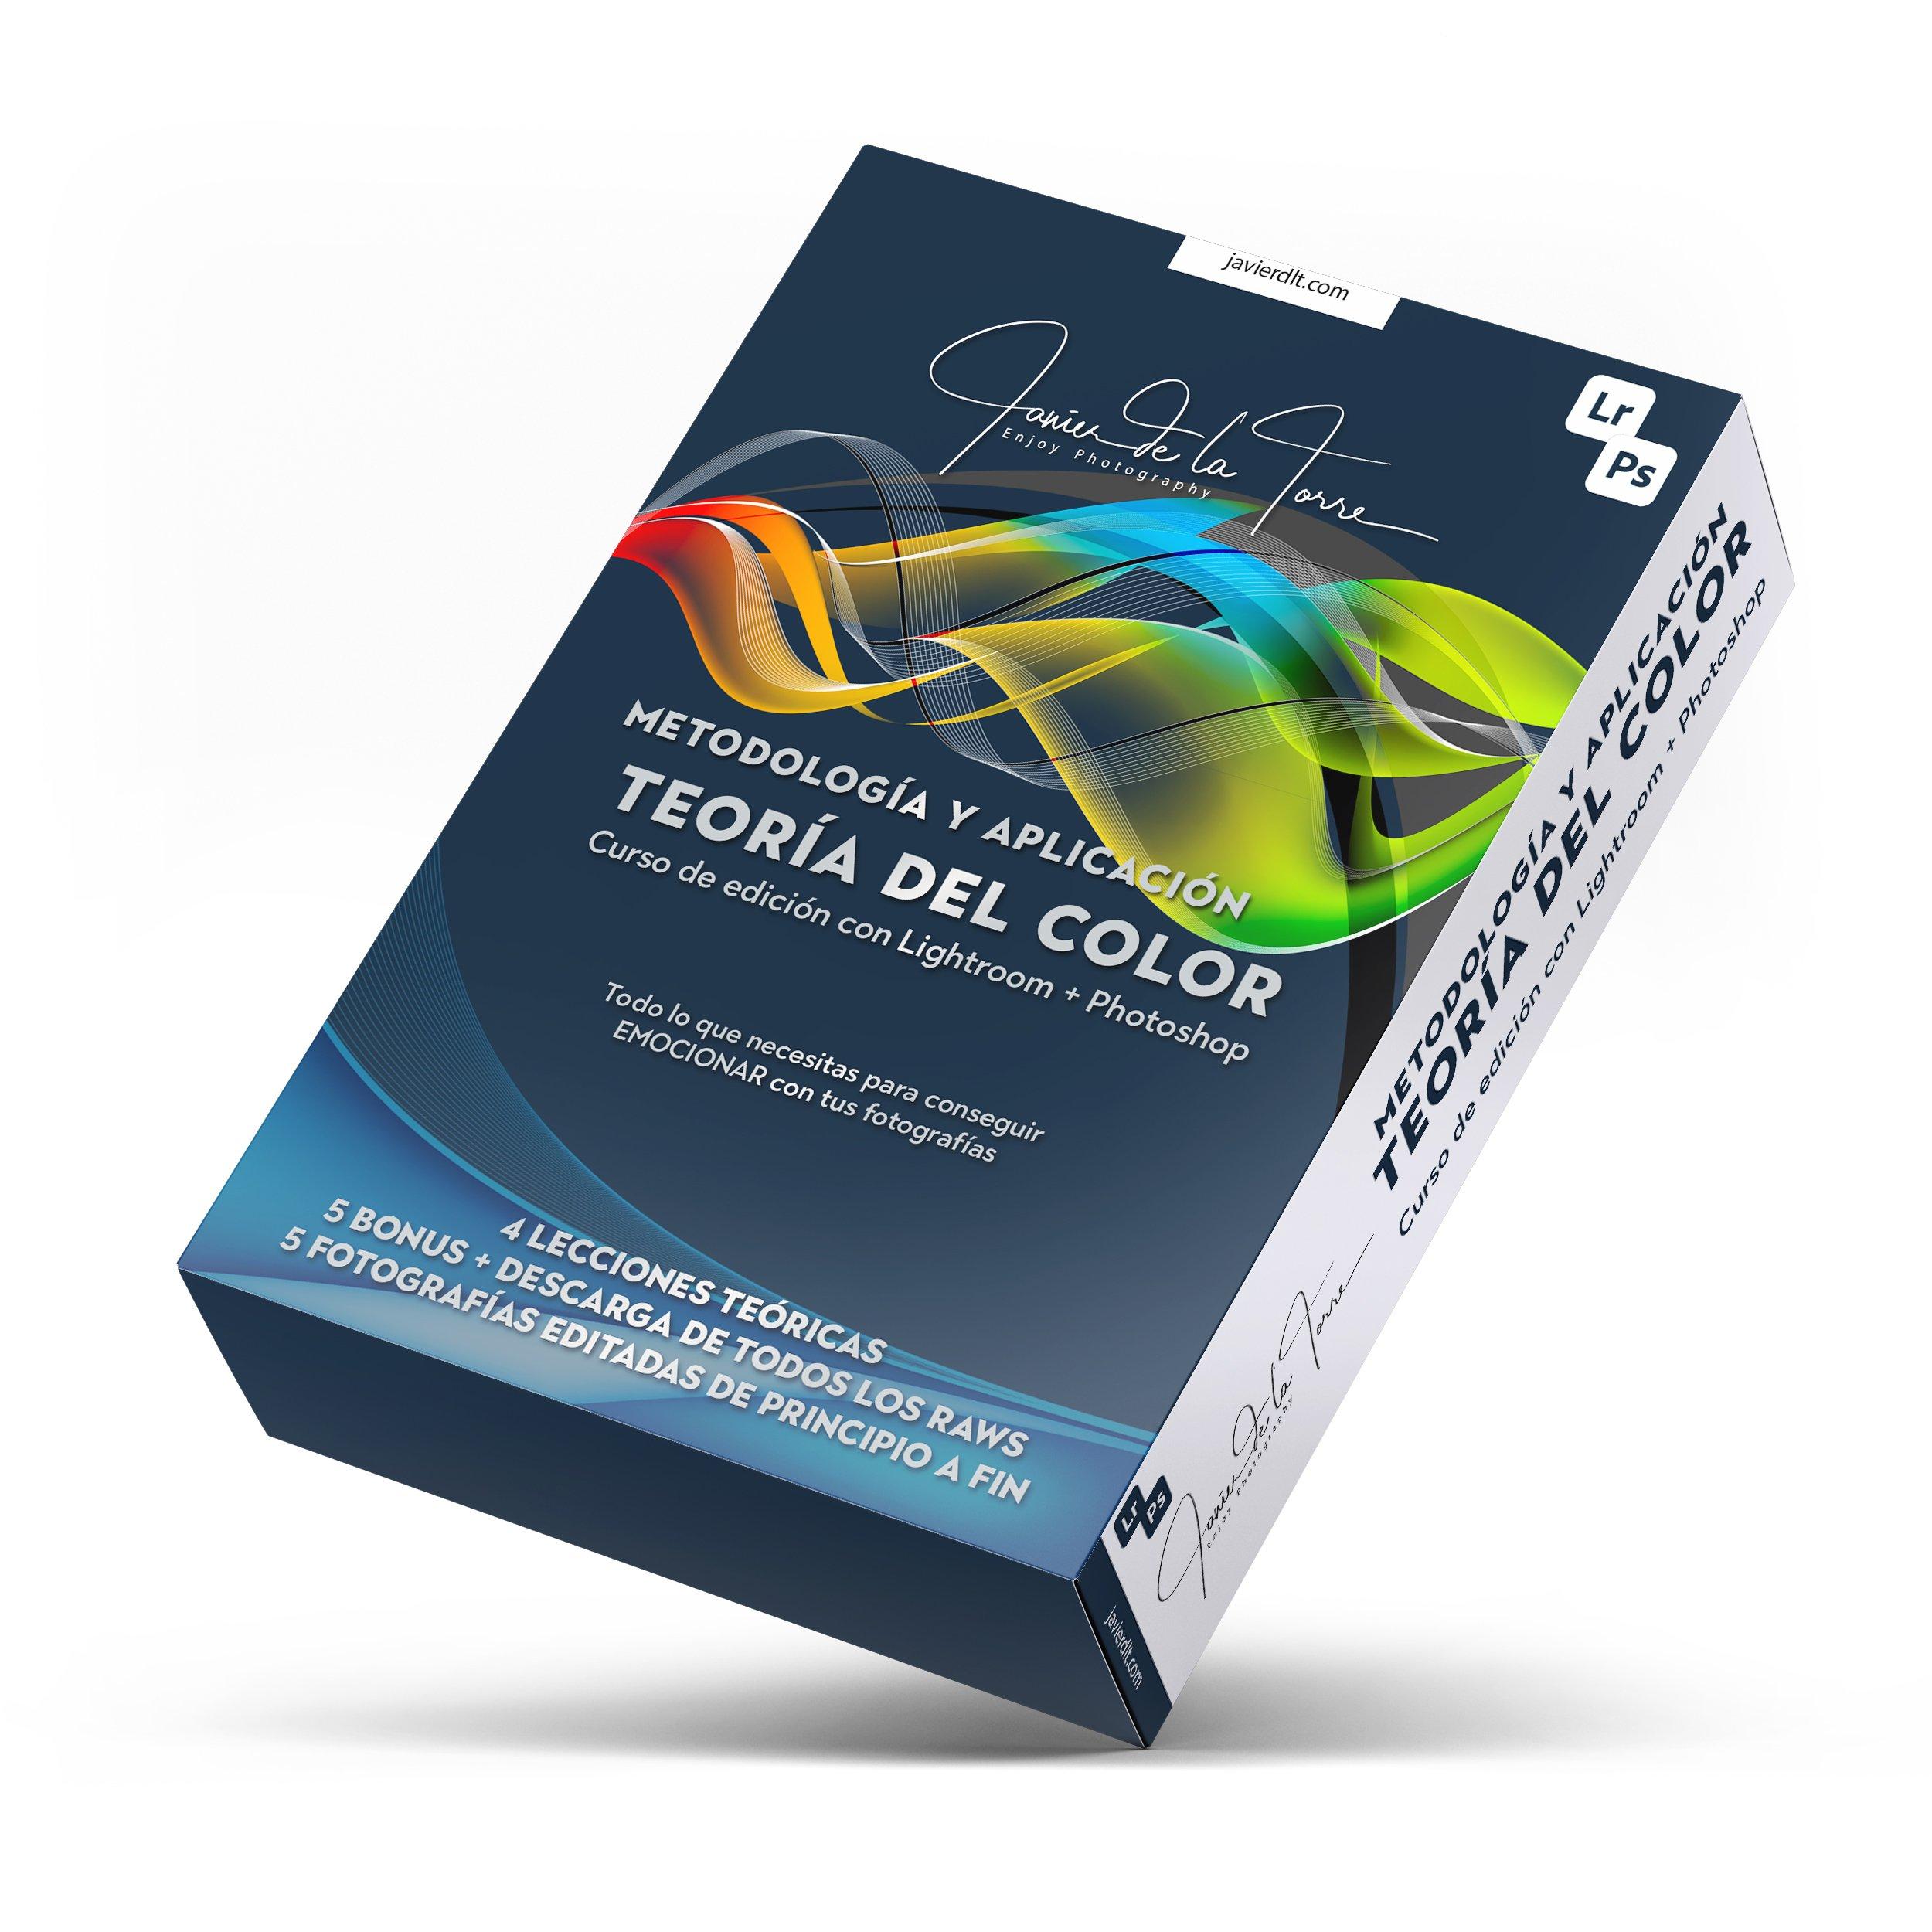 Caja de Venta Teoria del Color